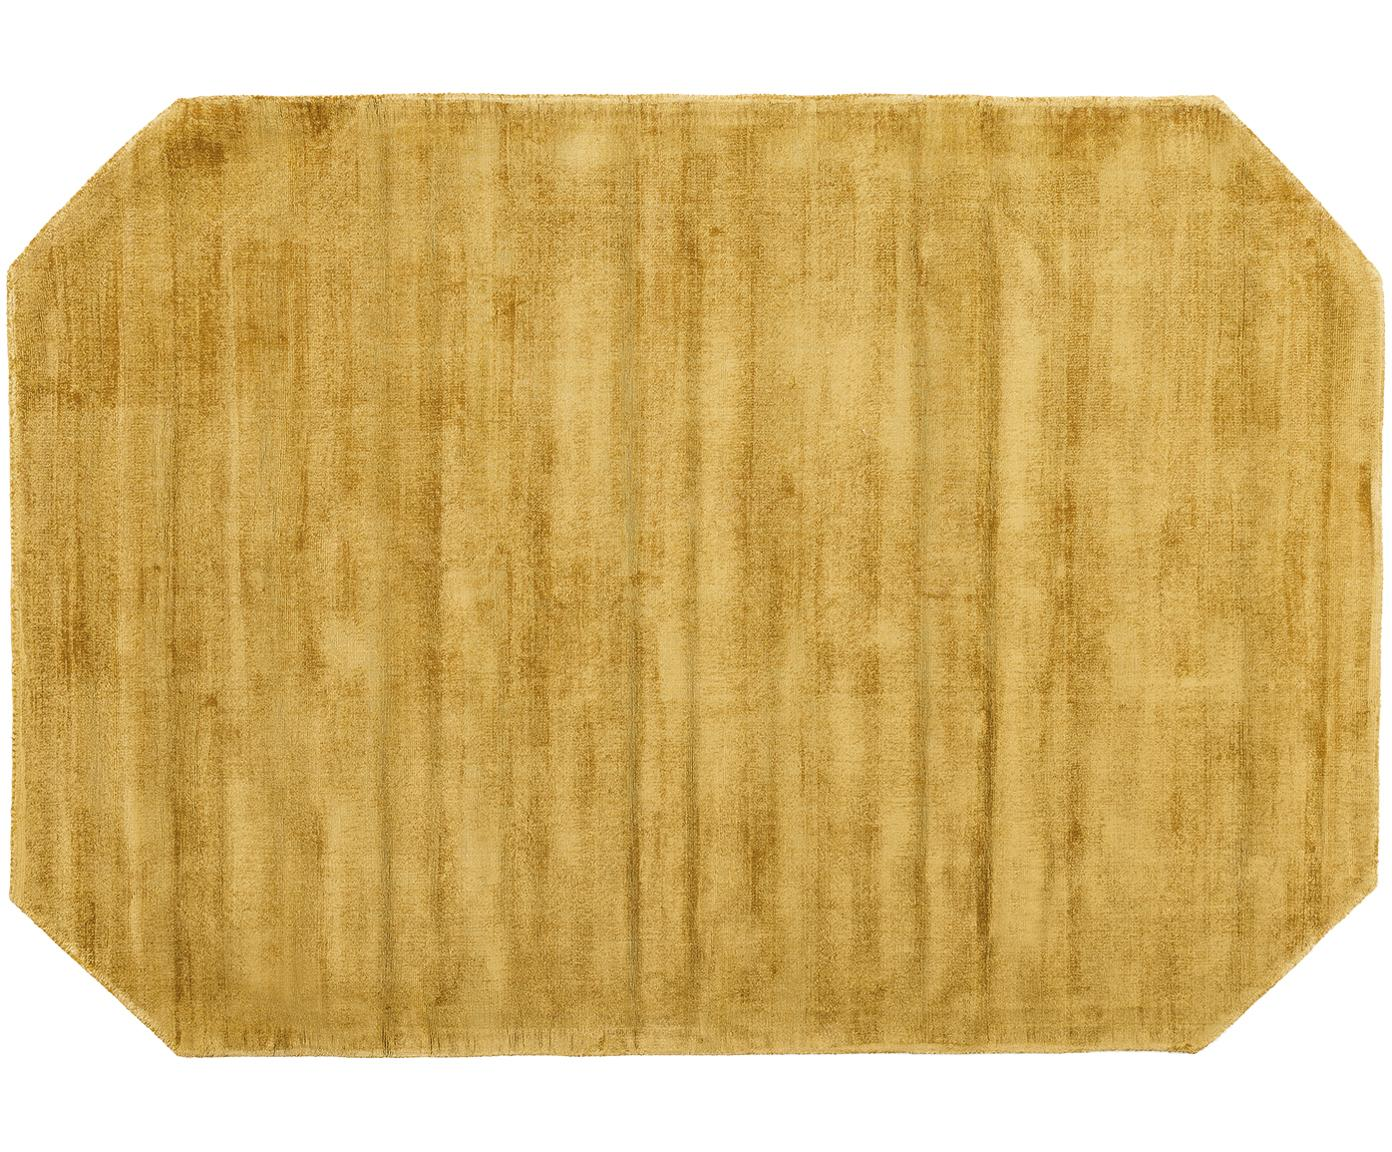 Handgewebter Viskoseteppich Jane Diamond in Senfgelb, Flor: 100% Viskose, Senfgelb, B 120 x L 180 cm (Grösse S)